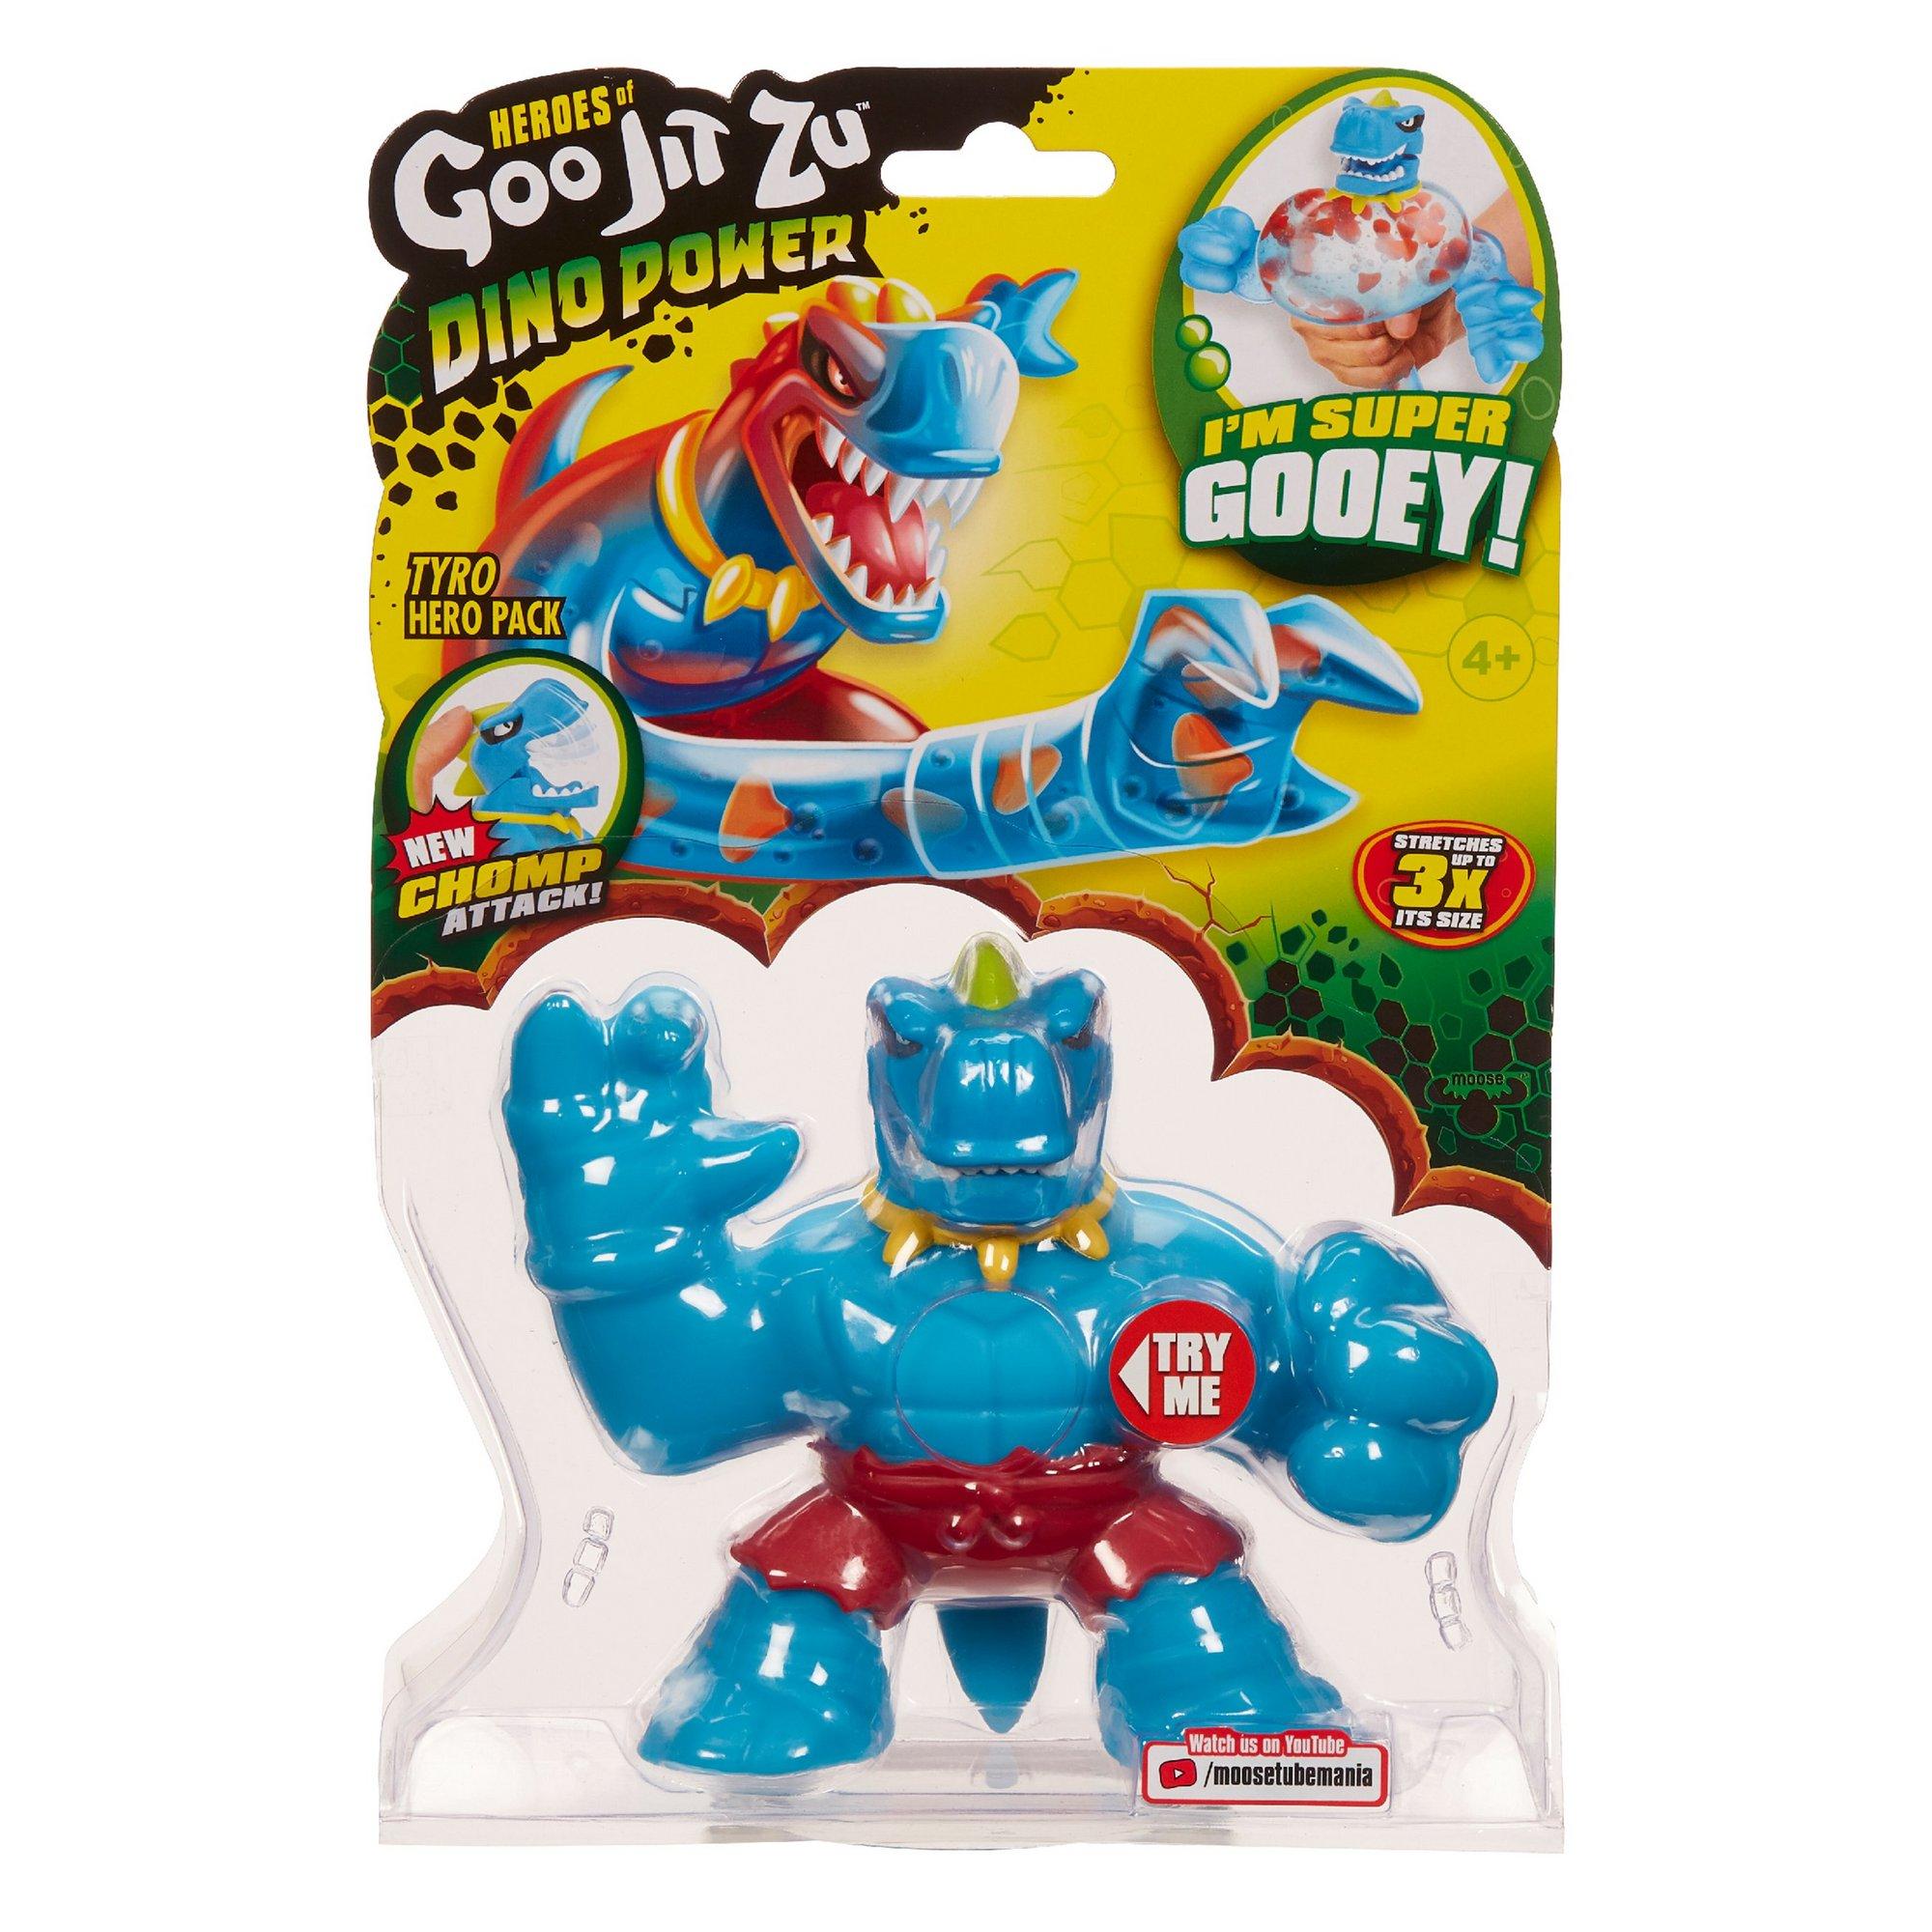 Image of Heroes Of Goo Jit Zu S3 Dino Power - Tyro The T-Rex